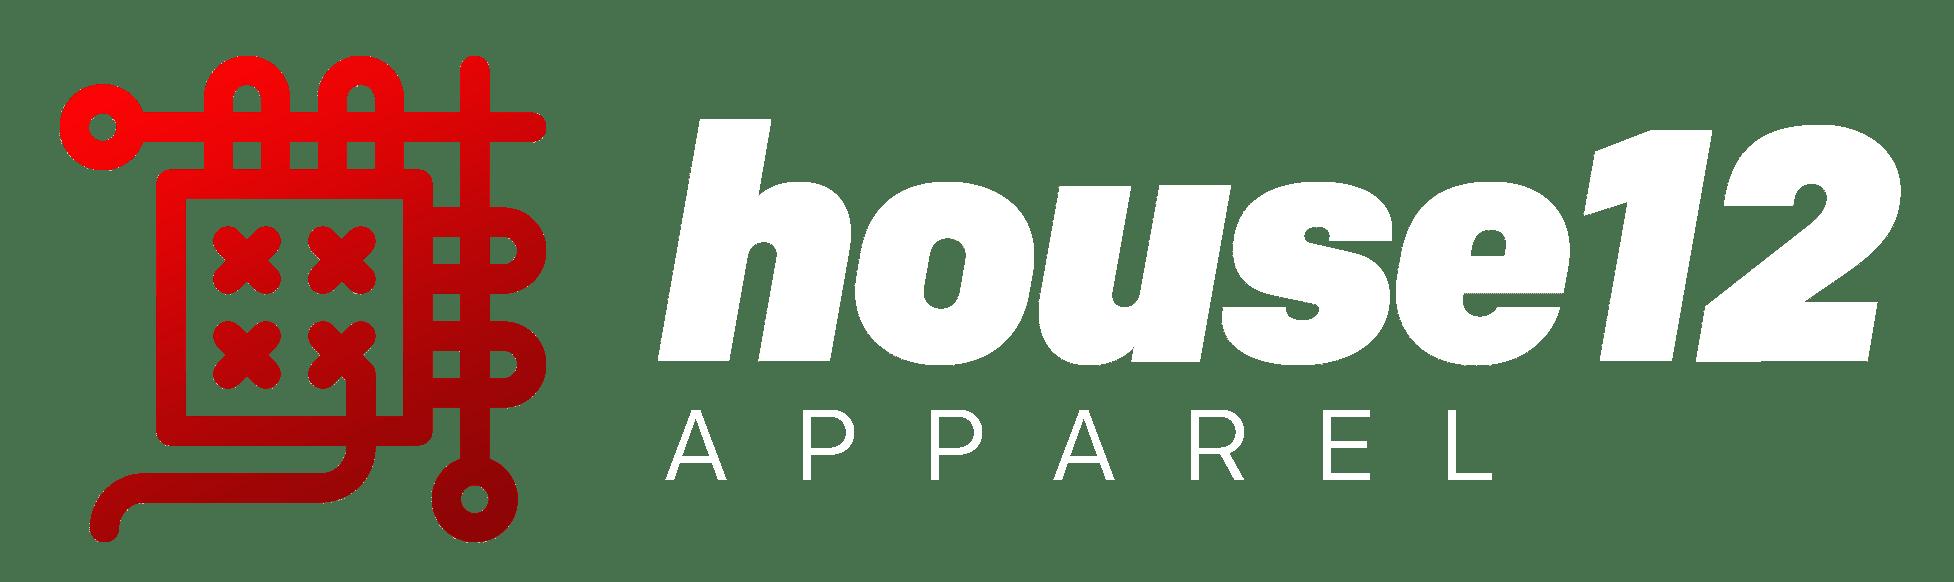 House12 Apparel